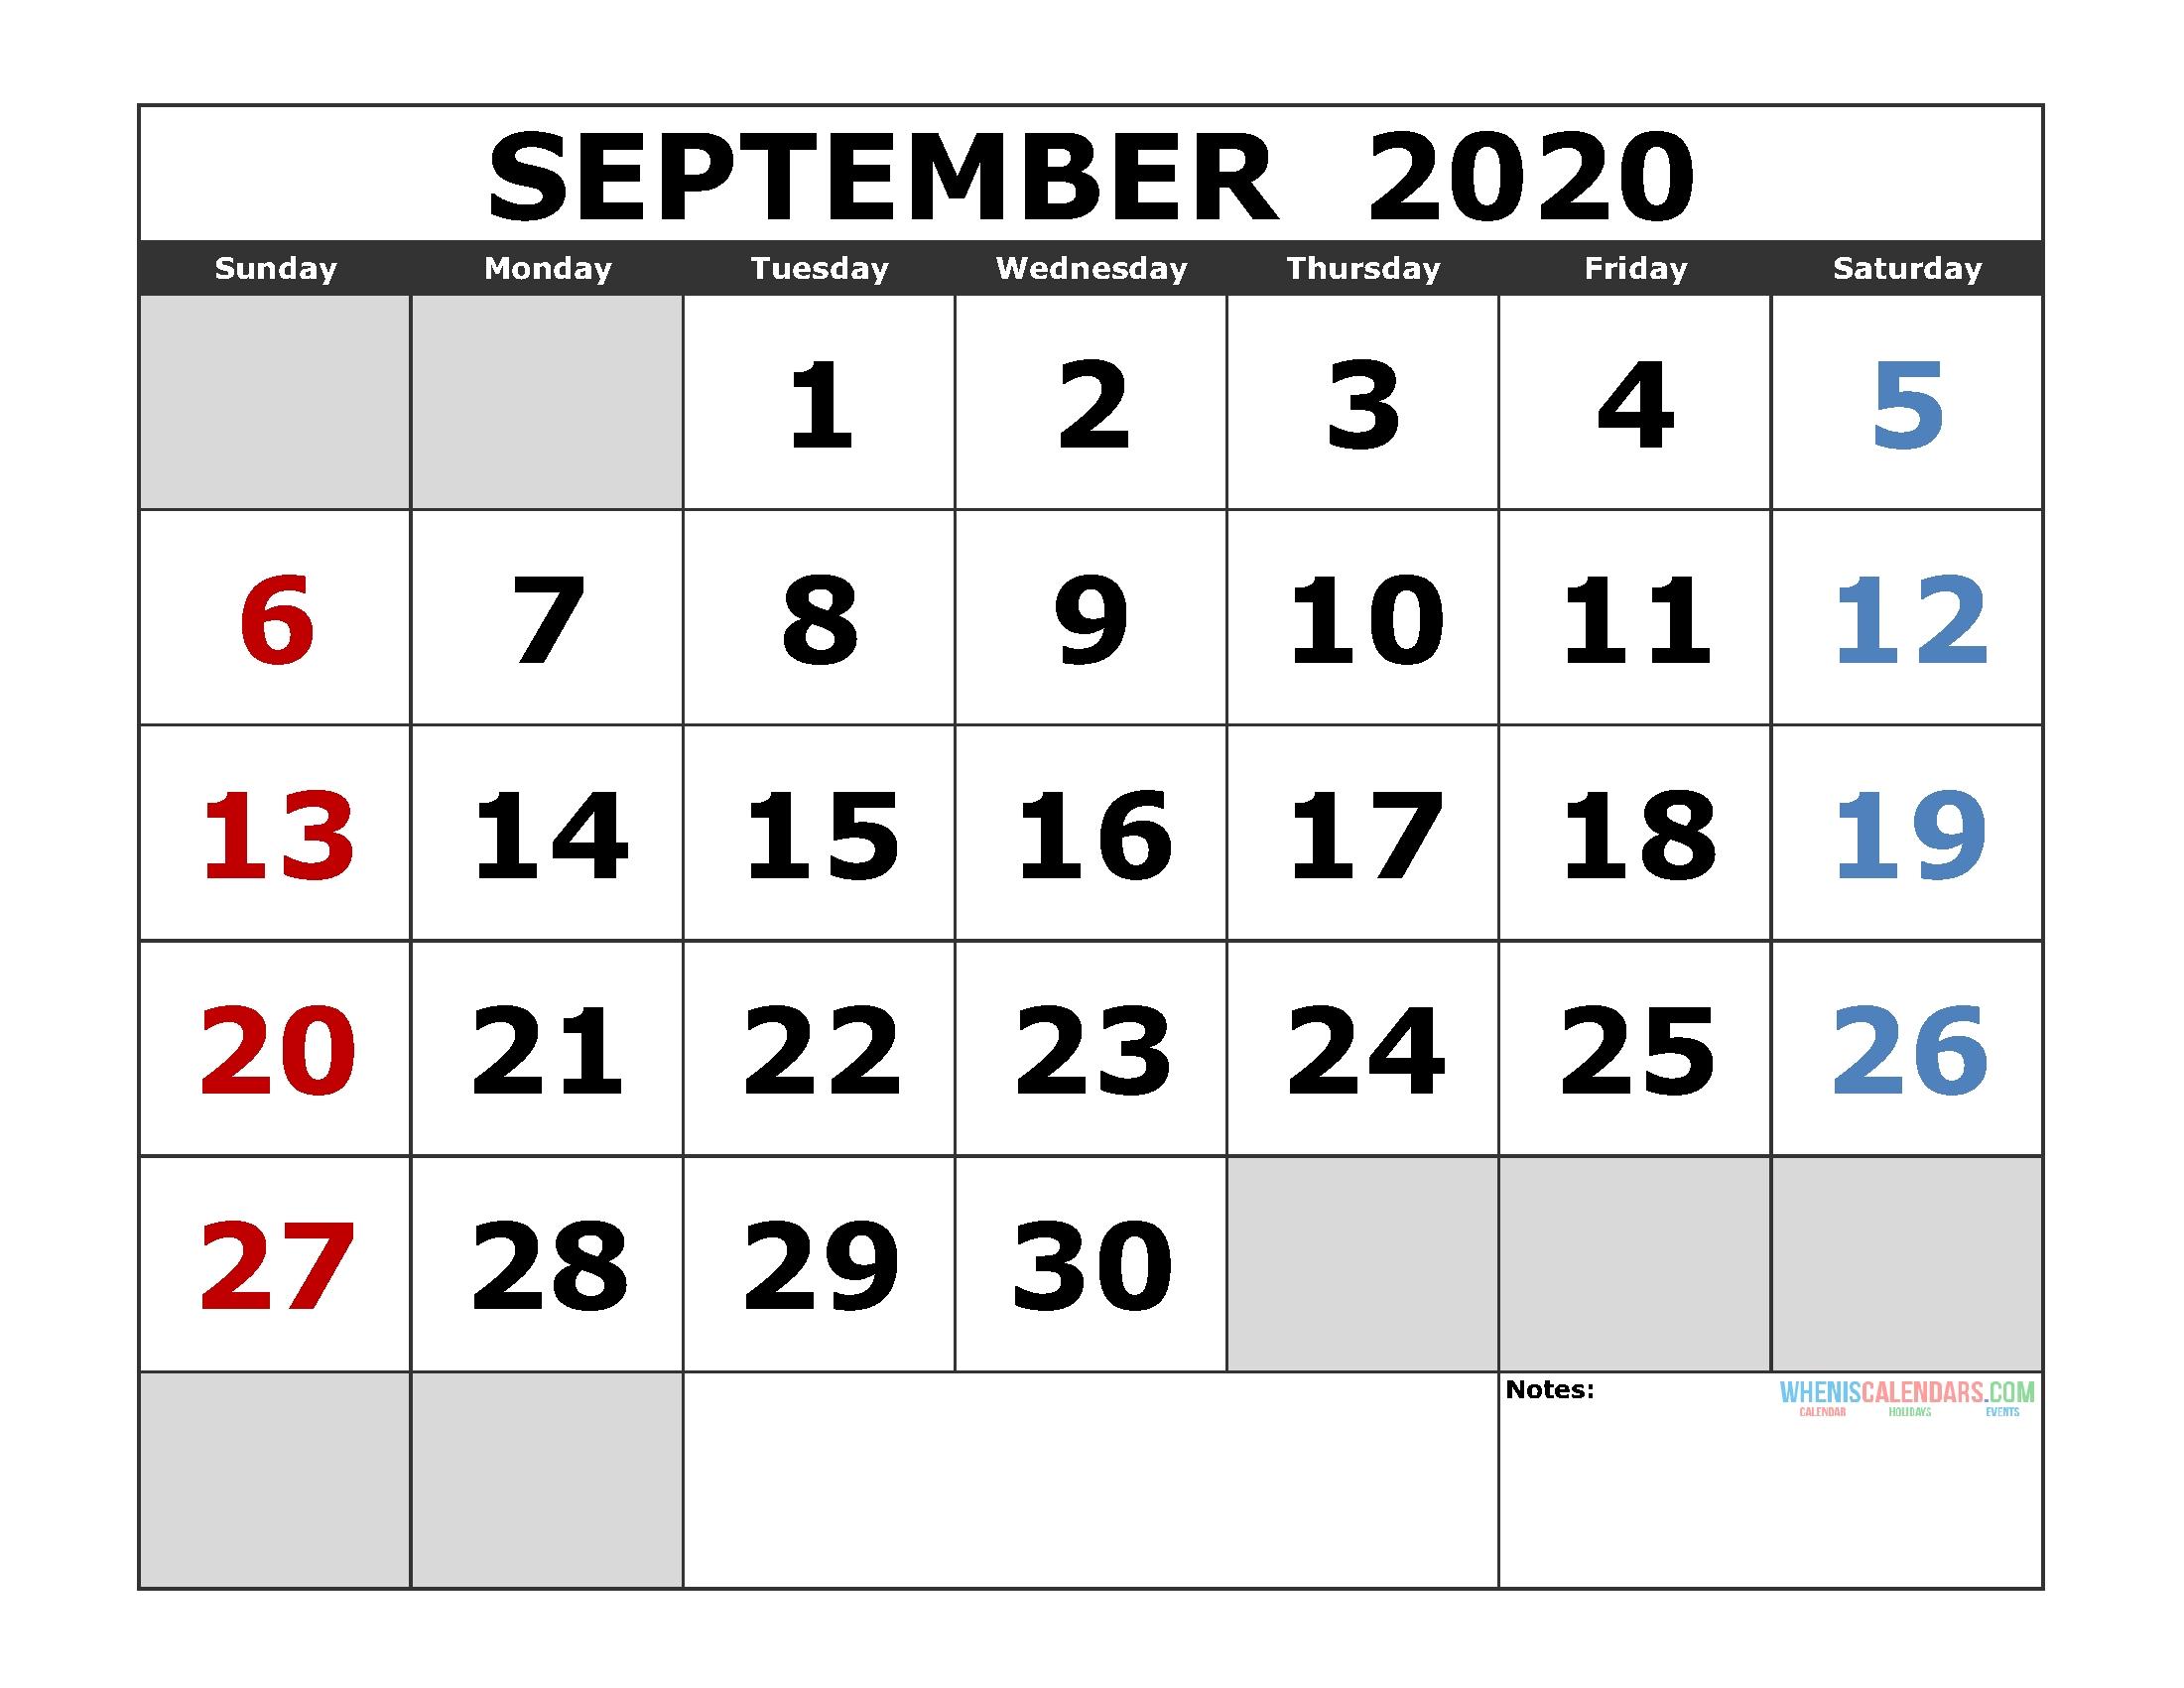 September 2020 Printable Calendar Template Excel, Pdf, Image  Printable Full Size Septmeber 2020 Calendar